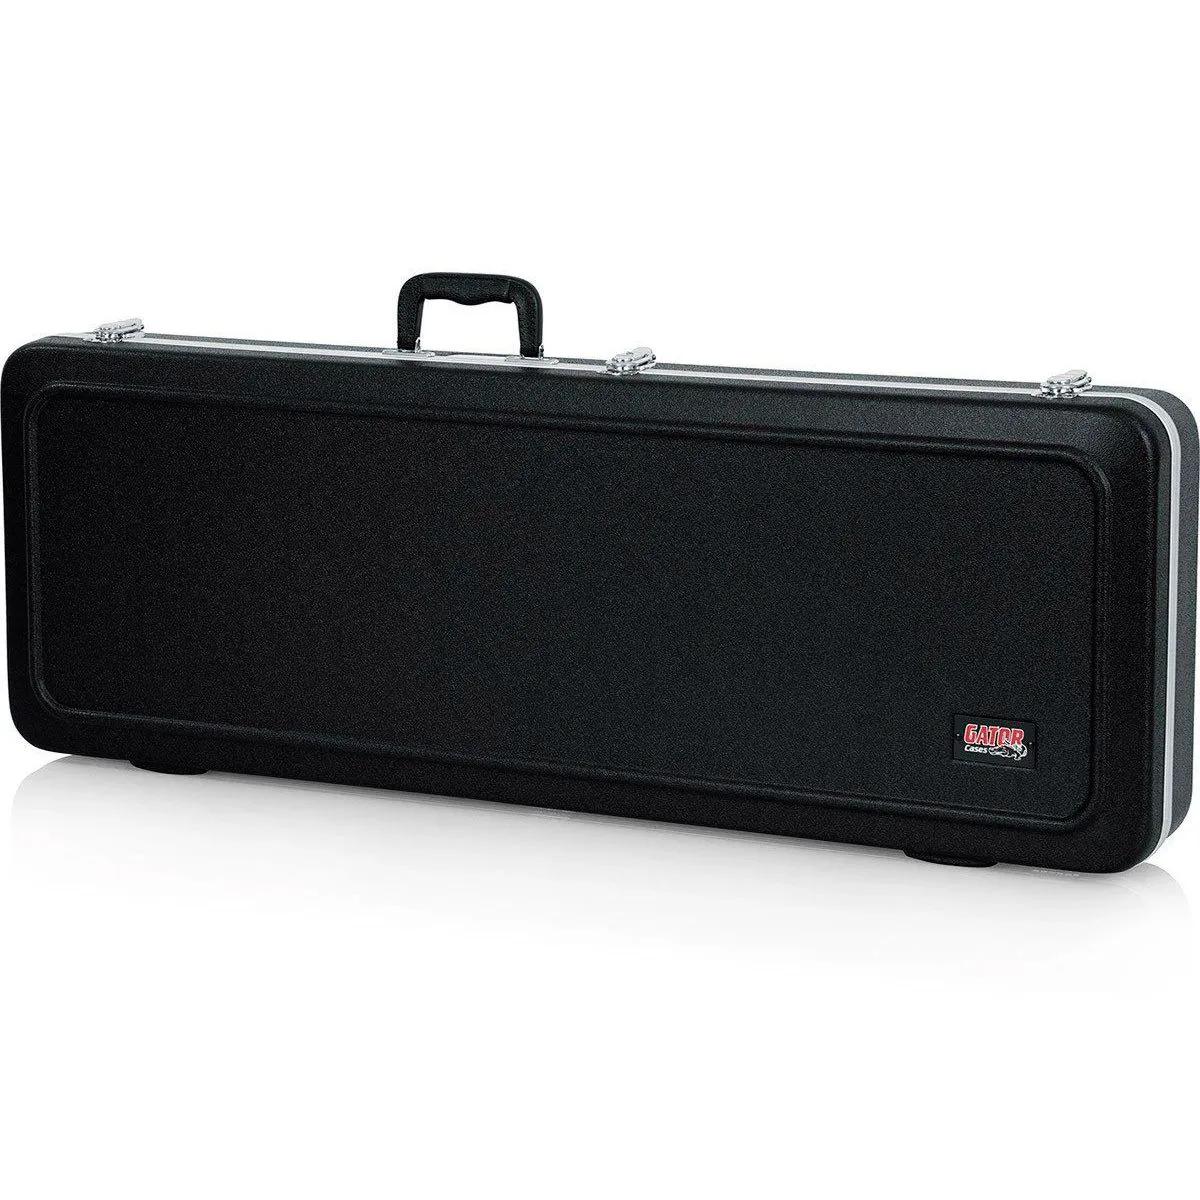 Case Gator GC-ELECTRIC-T para Guitarra em ABS